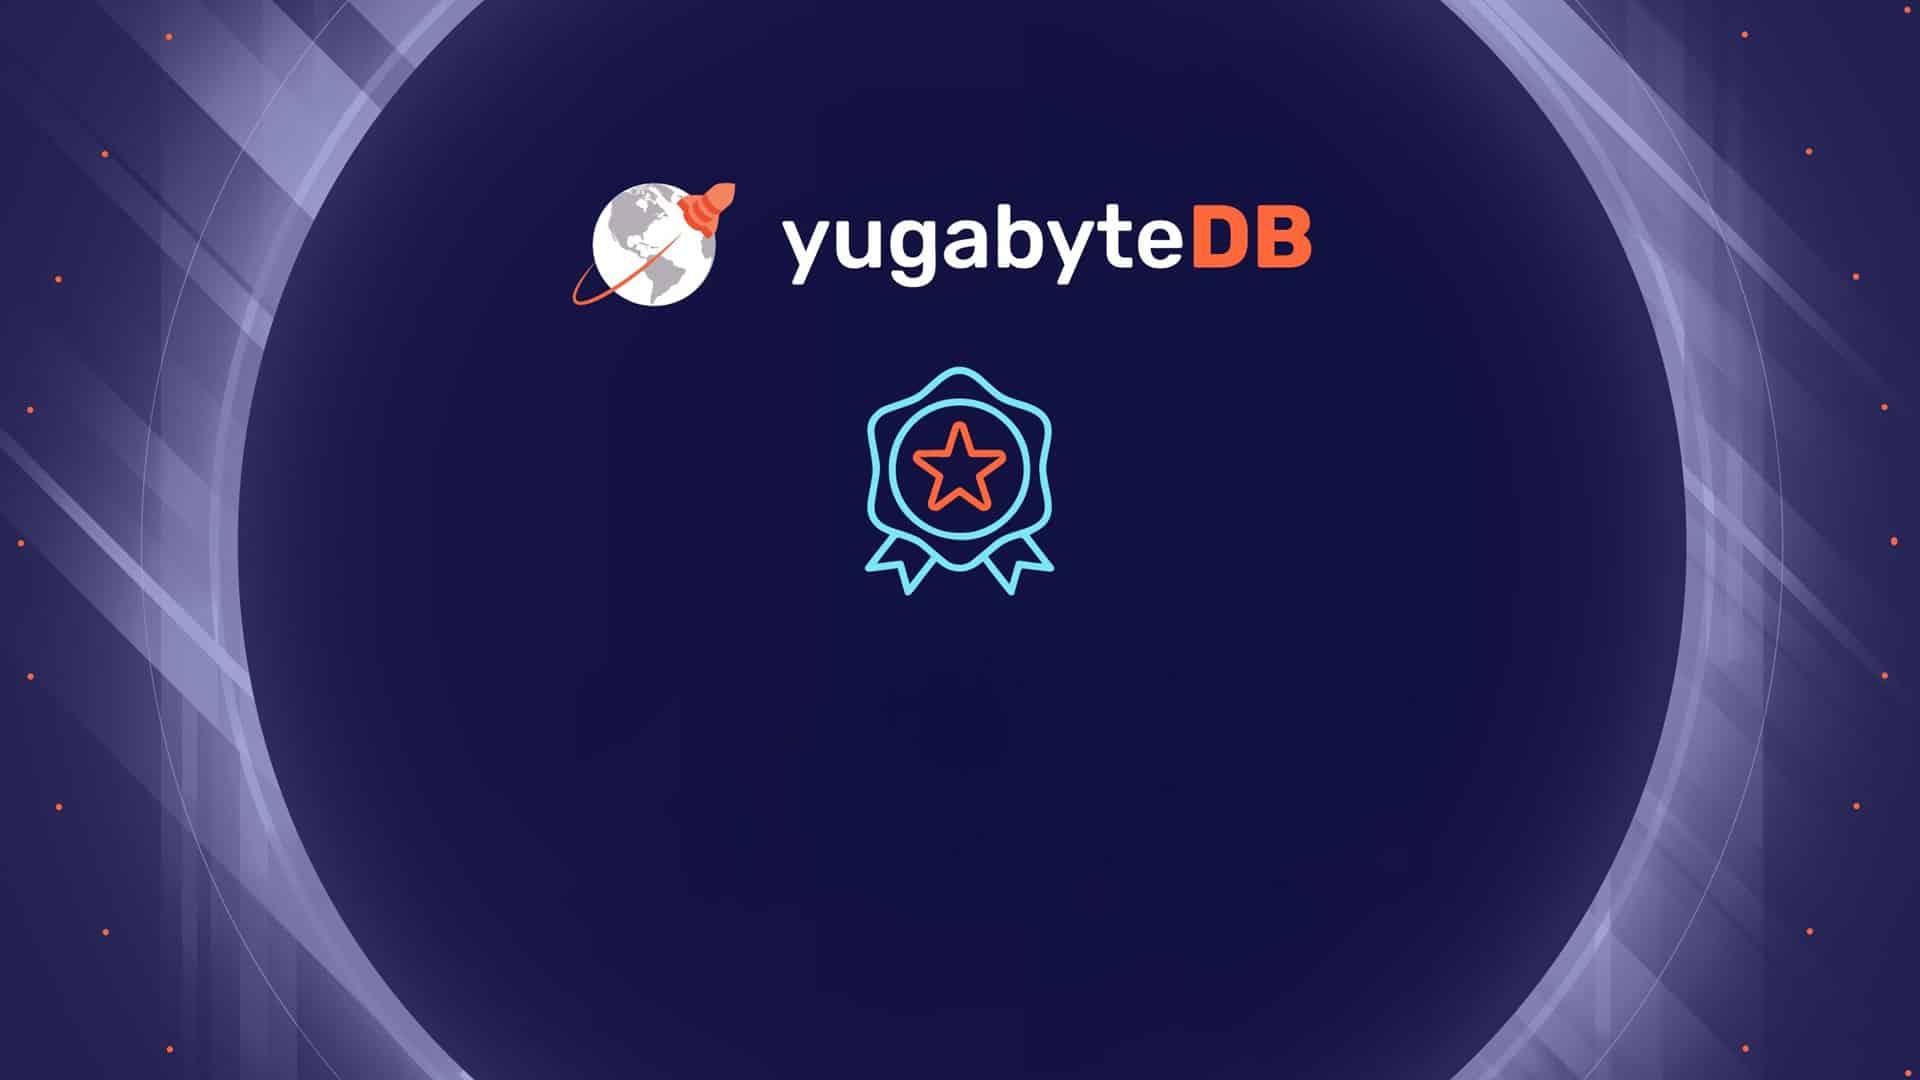 Yugabyte raises $48 million in funding round led by Lightspeed Venture